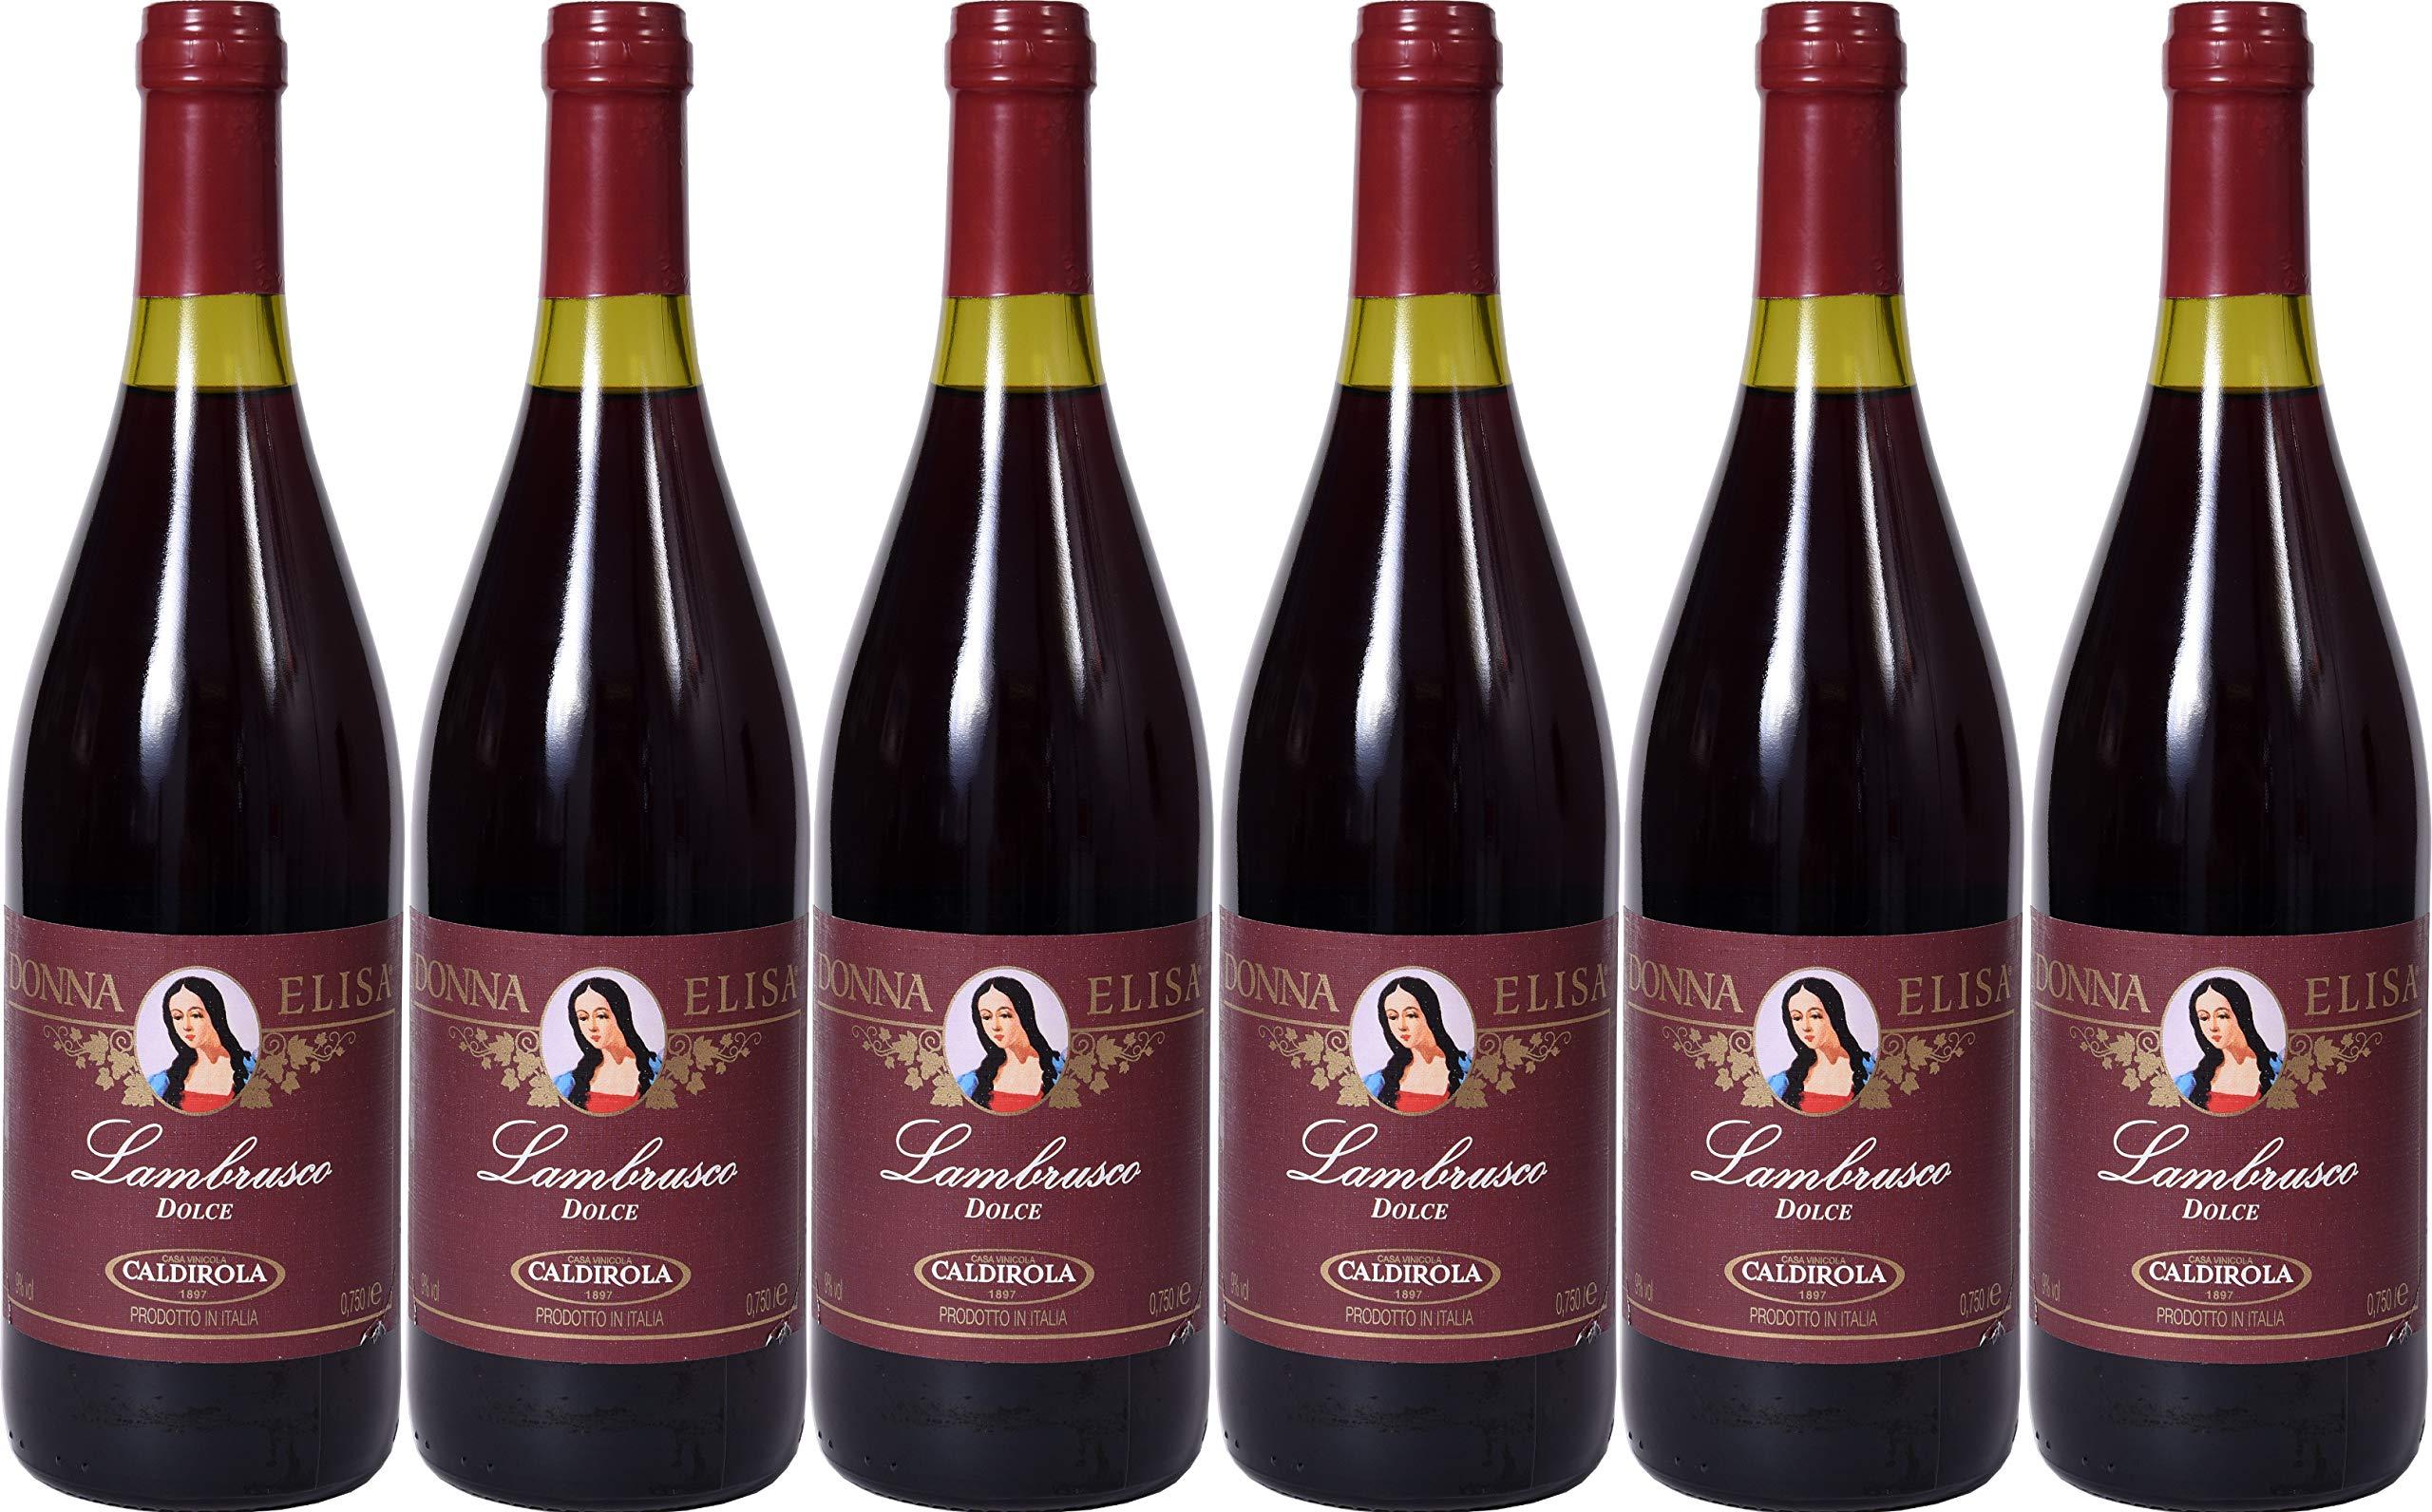 Lambrusco-rosso-dolce-Puglia-Donna-Elisa-Caldirola-IGT-6-X-075-L-Vino-Roter-Ser-9-Vol-aus-Italien